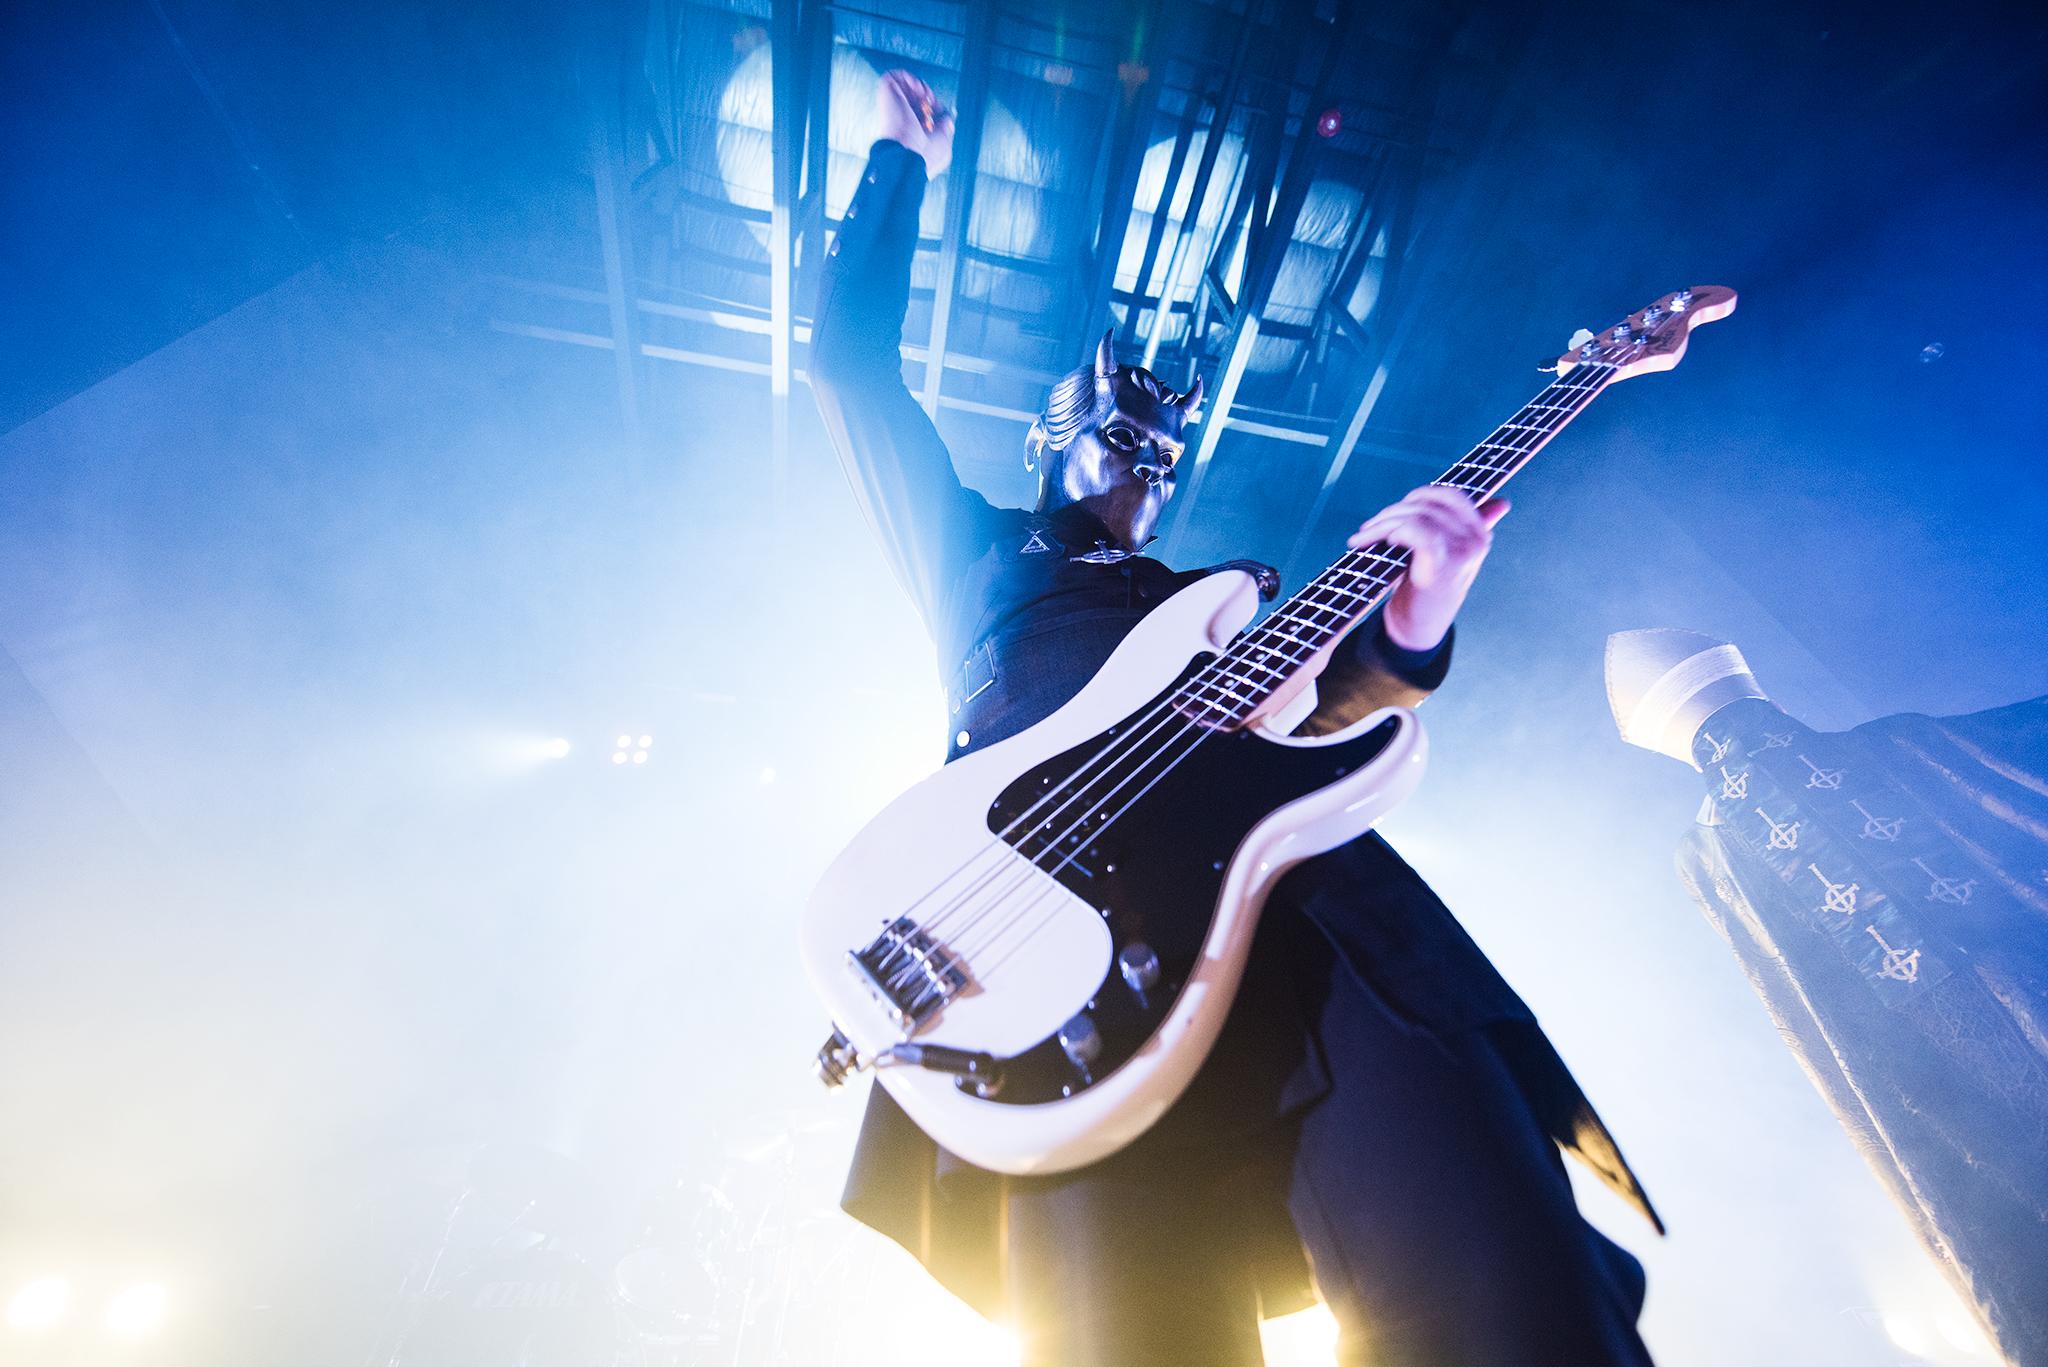 Ghost-Emos-Concert-Photography-Katrina-Barber-8.jpg